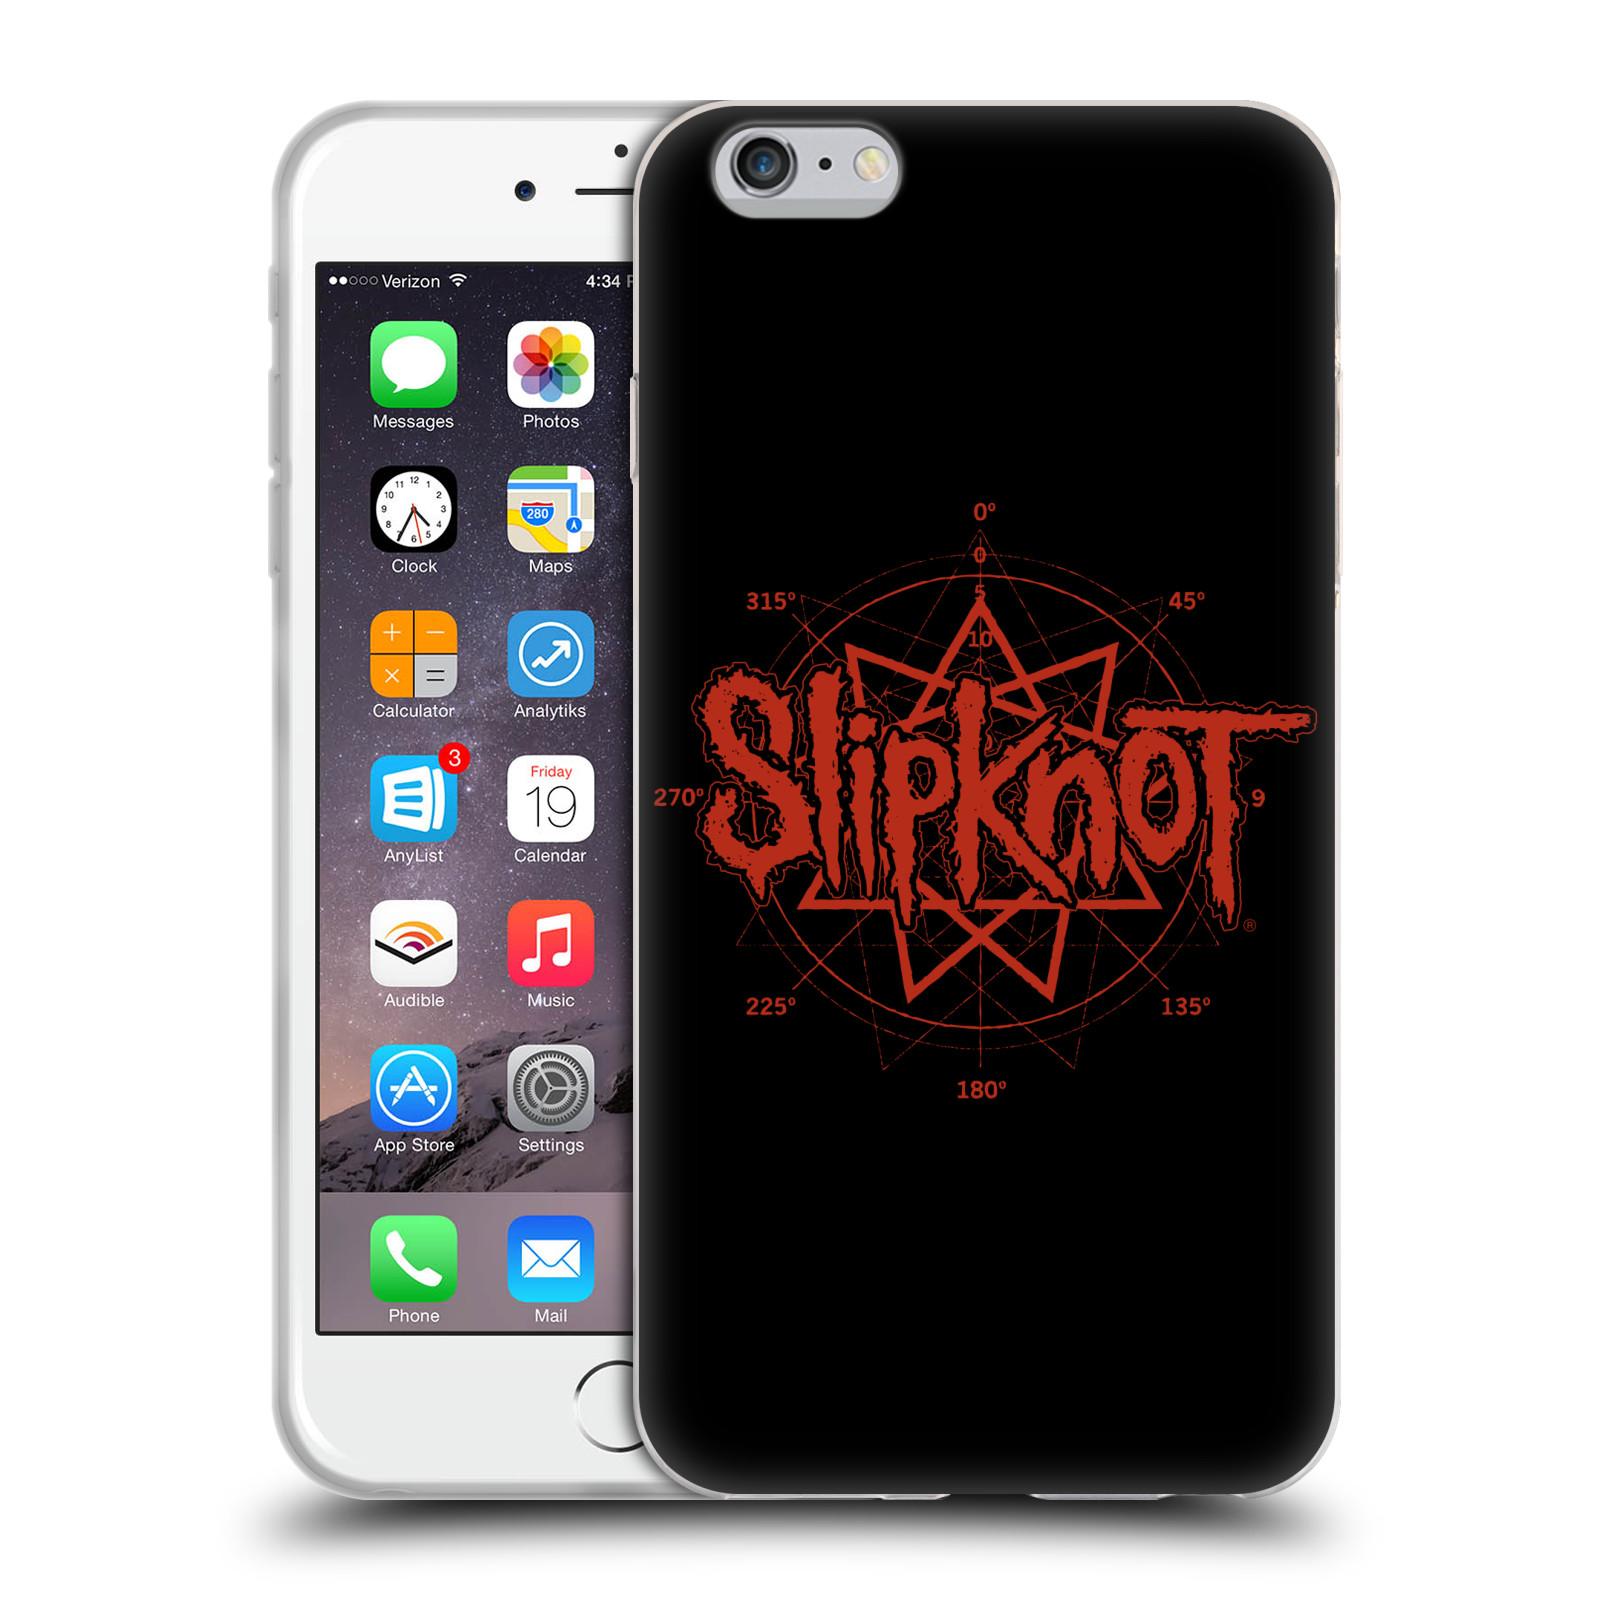 HEAD CASE silikonový obal na mobil Apple Iphone 6/6S PLUS hudební skupina Slipknot logo